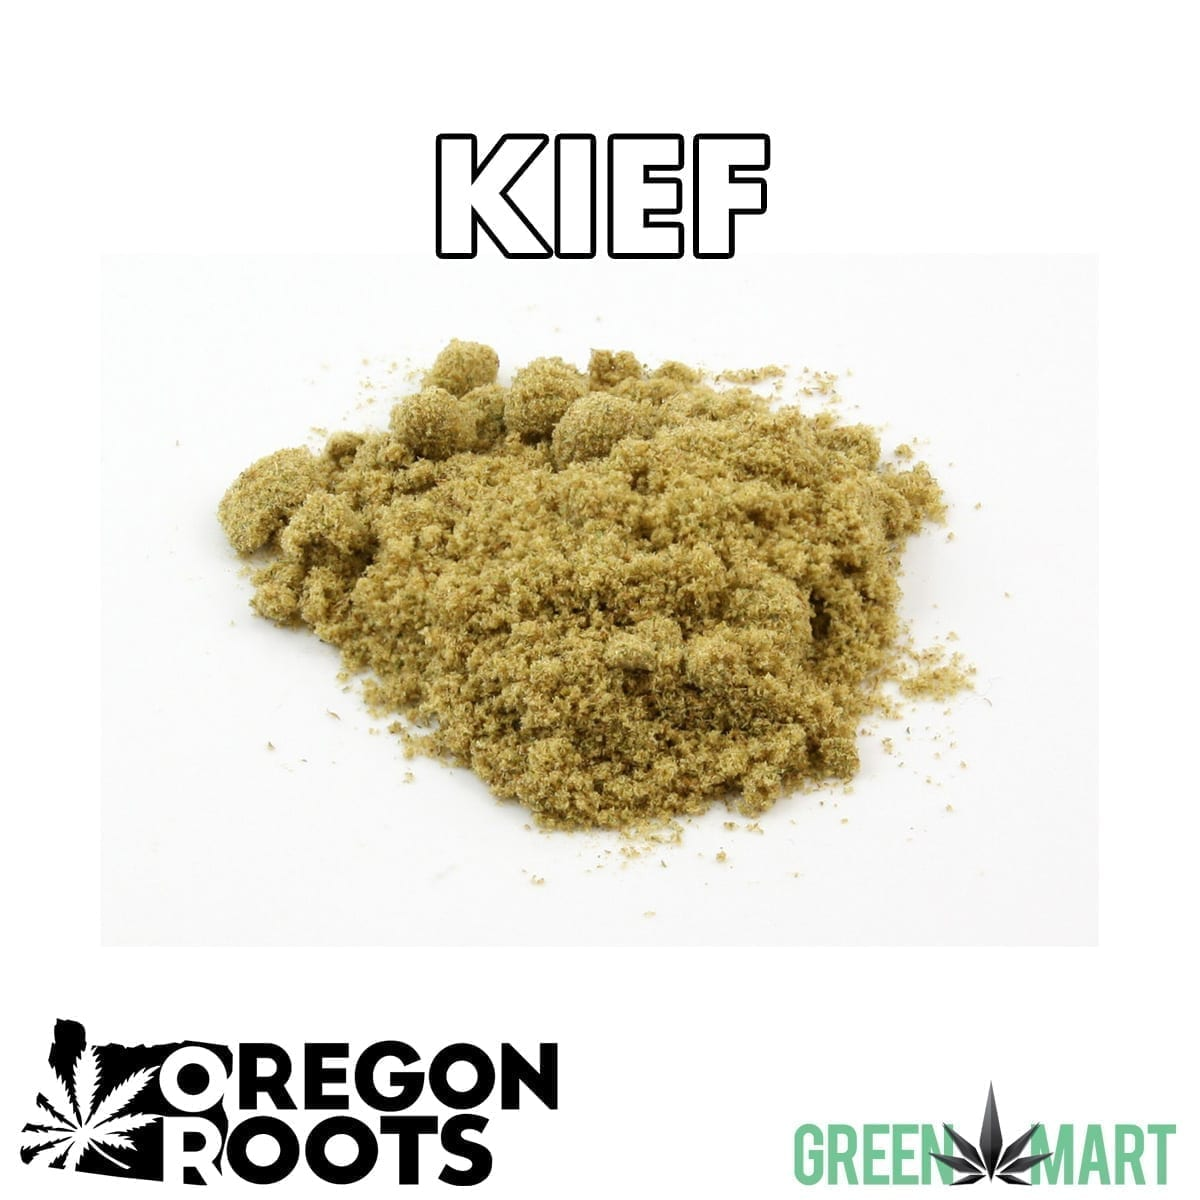 Oregon Roots Kief